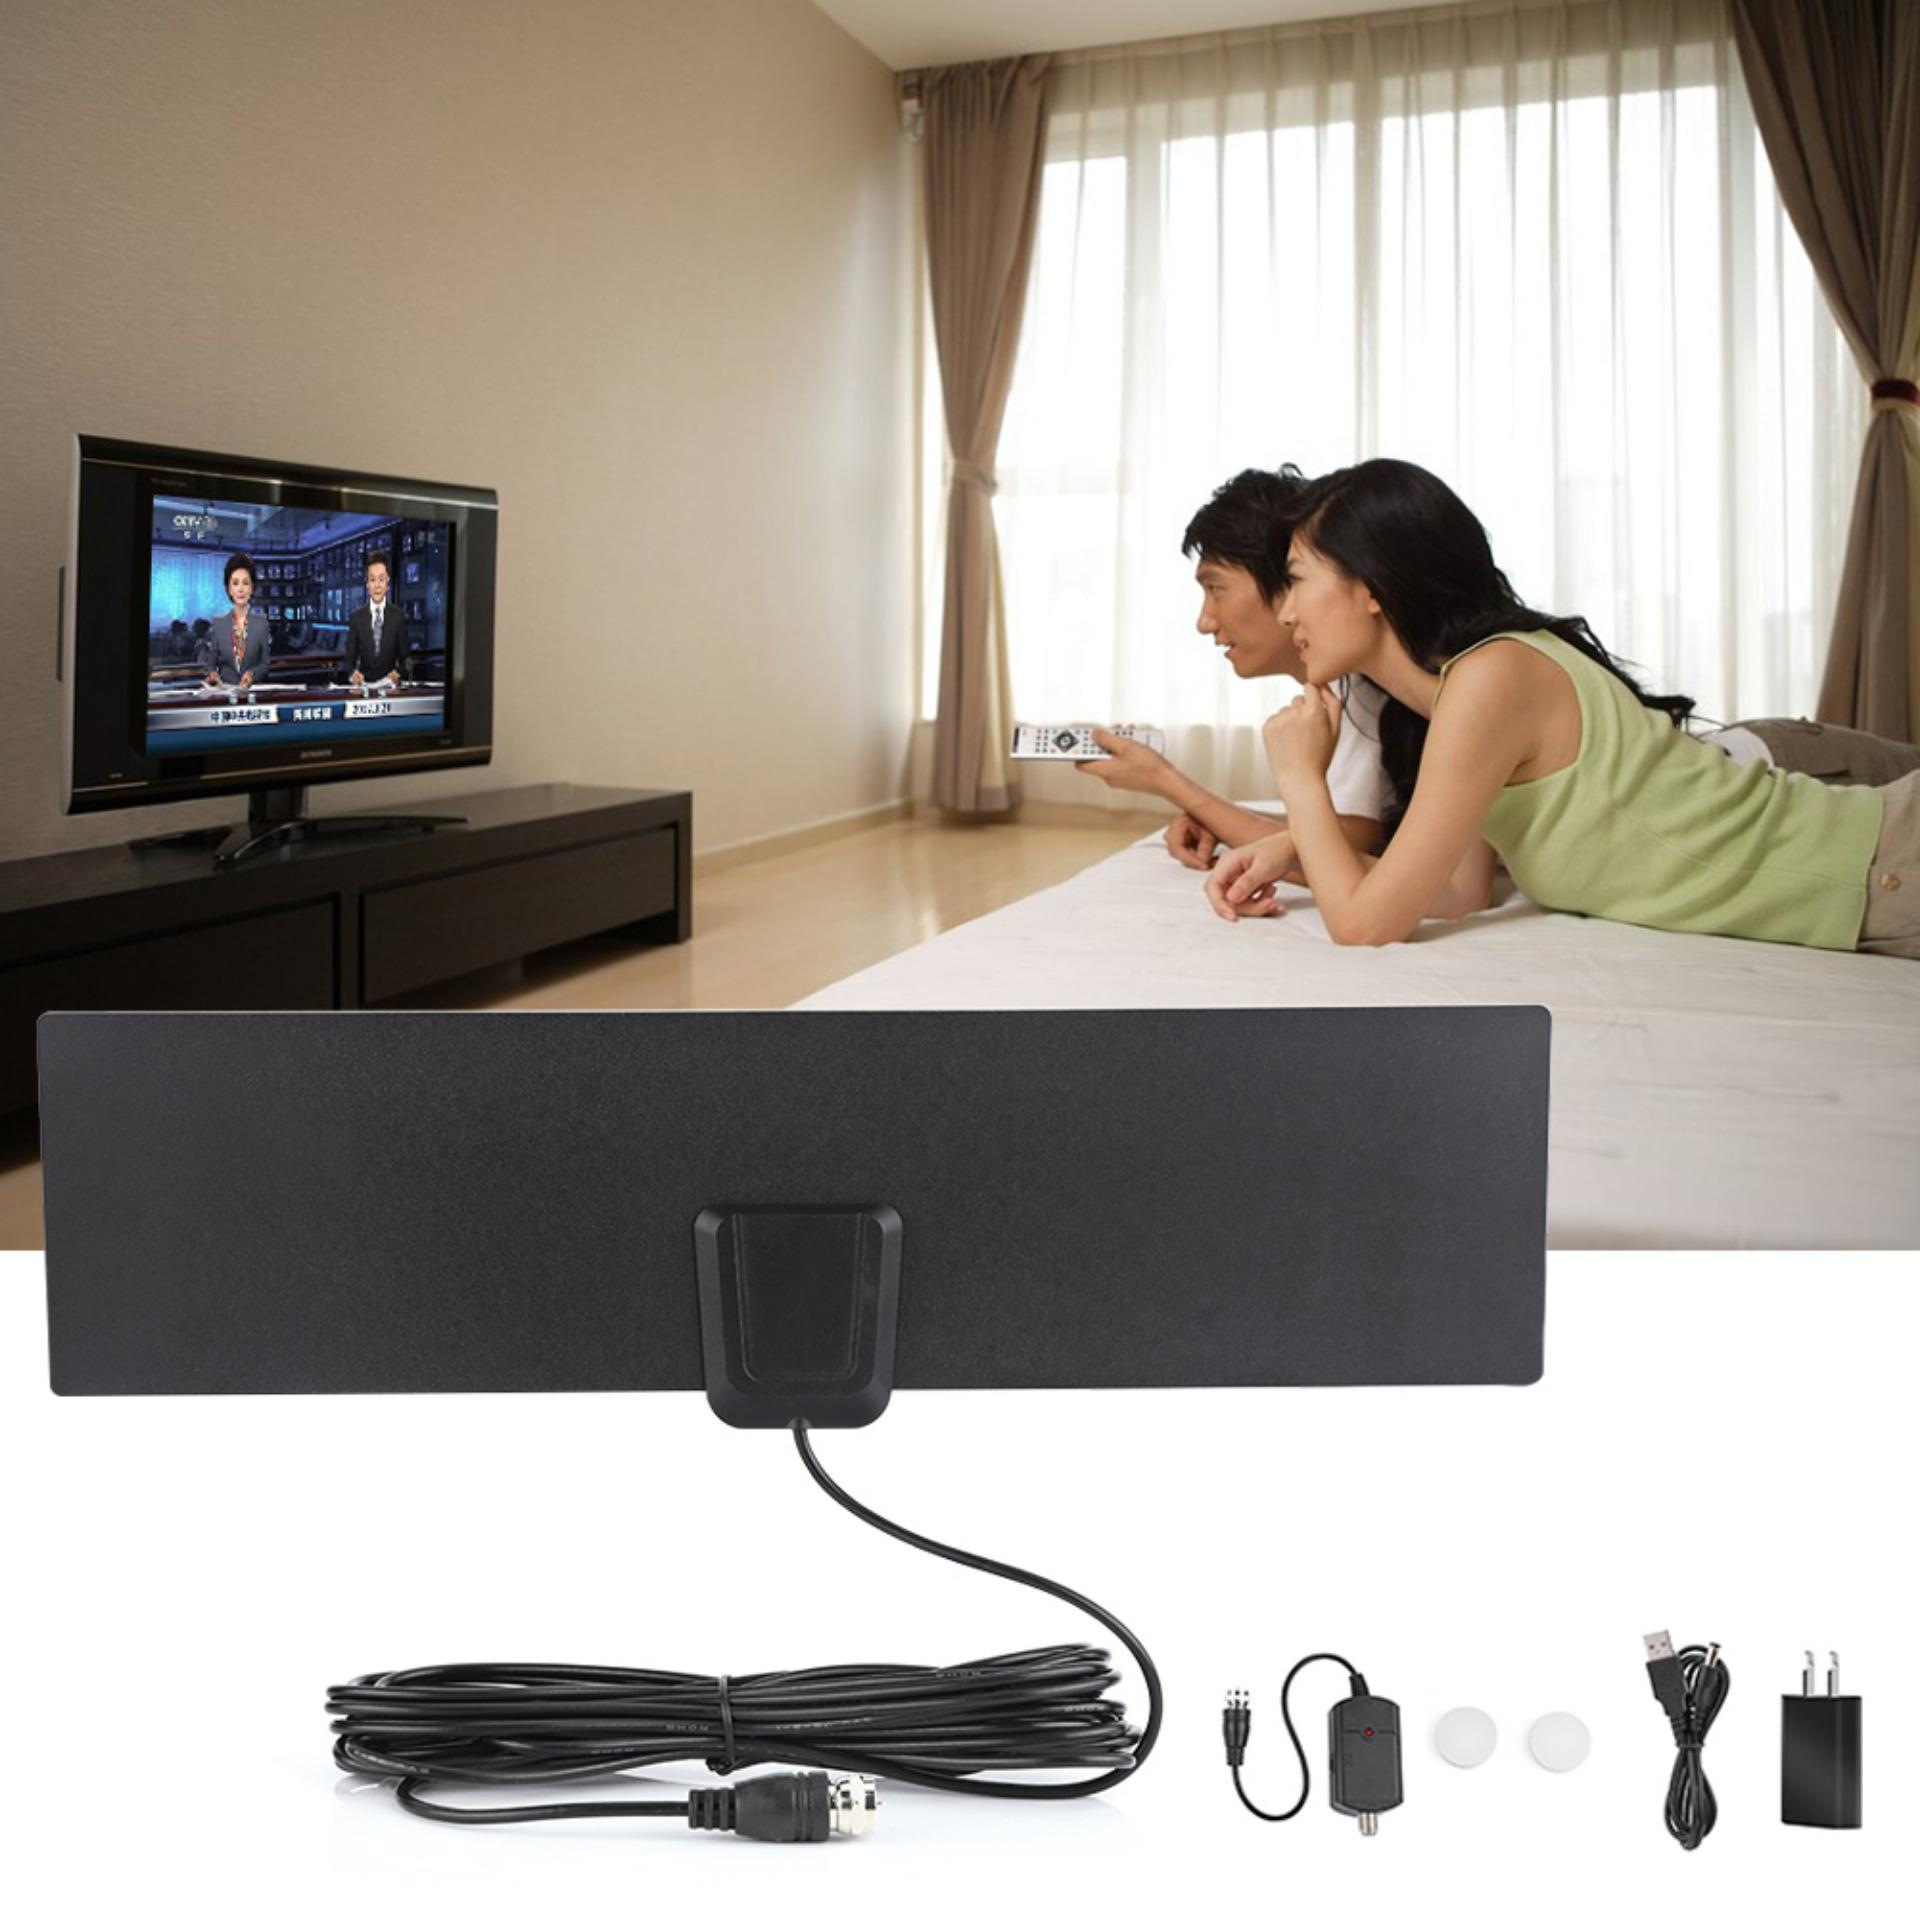 Latest Ultra Thin 50 Miles High Gain Indoor Amplifier Digital Flat Tv Hdtv Antenna Eu Plug Intl